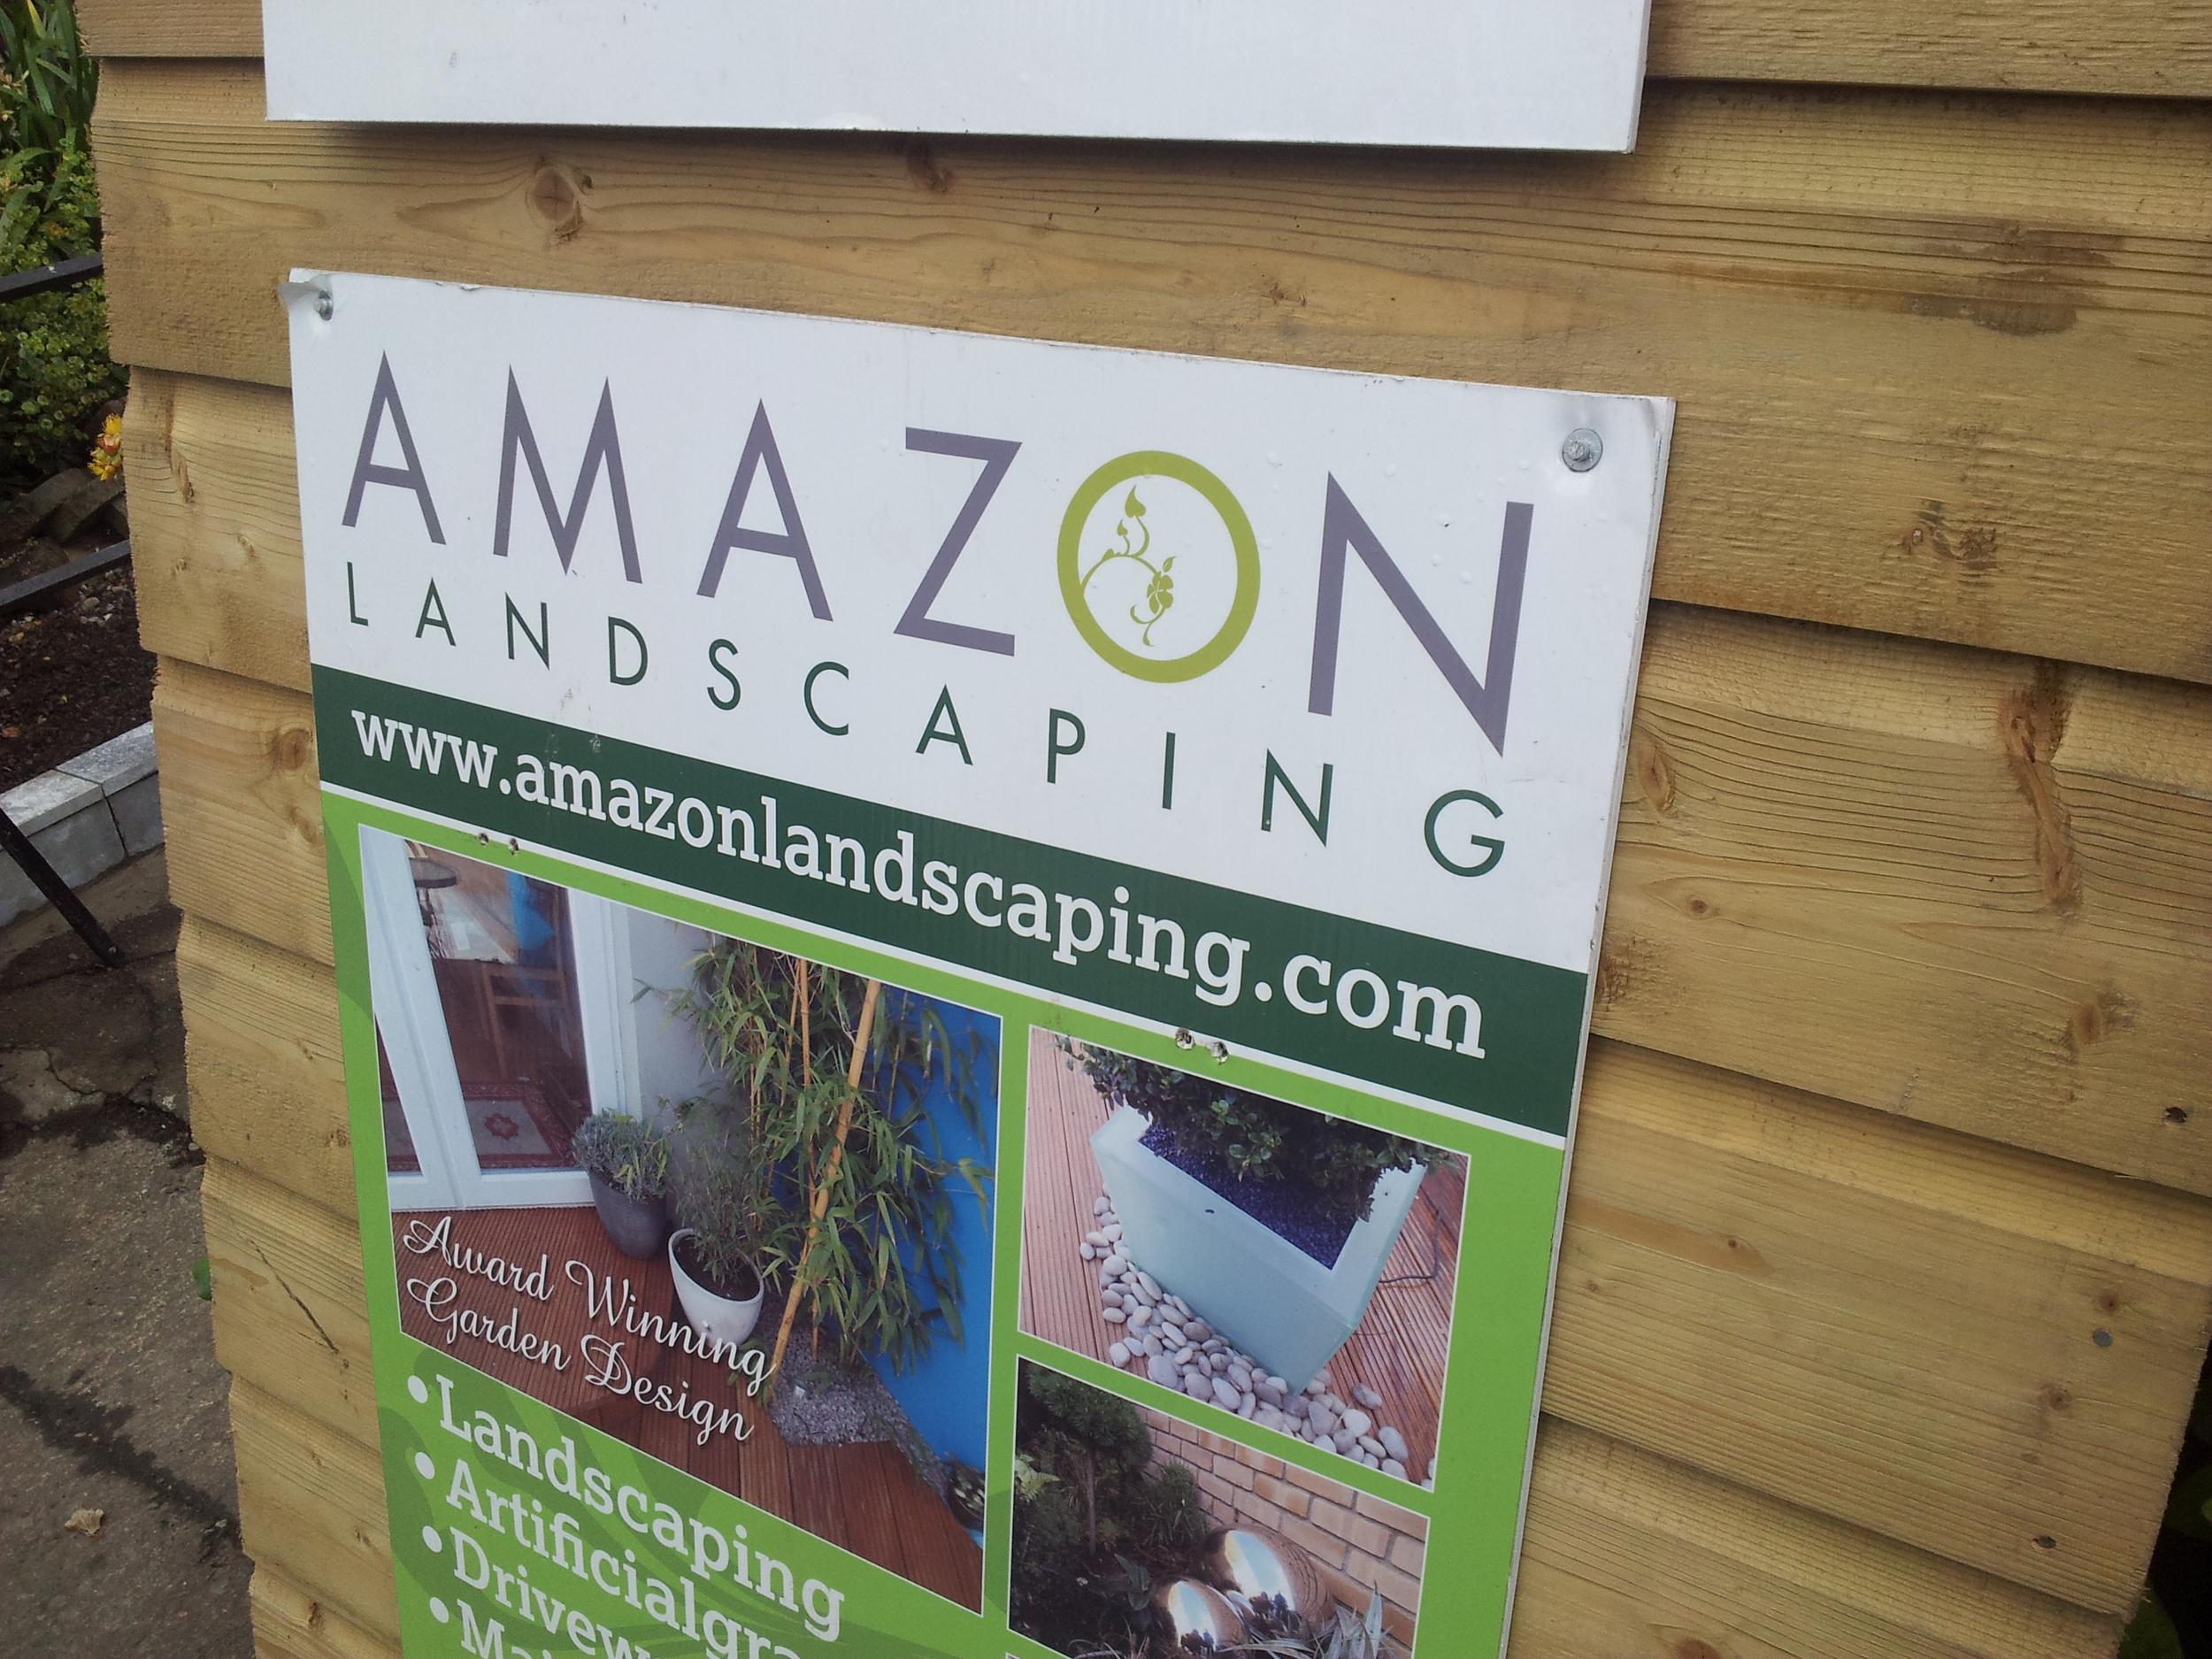 Amazon Landscaping sign